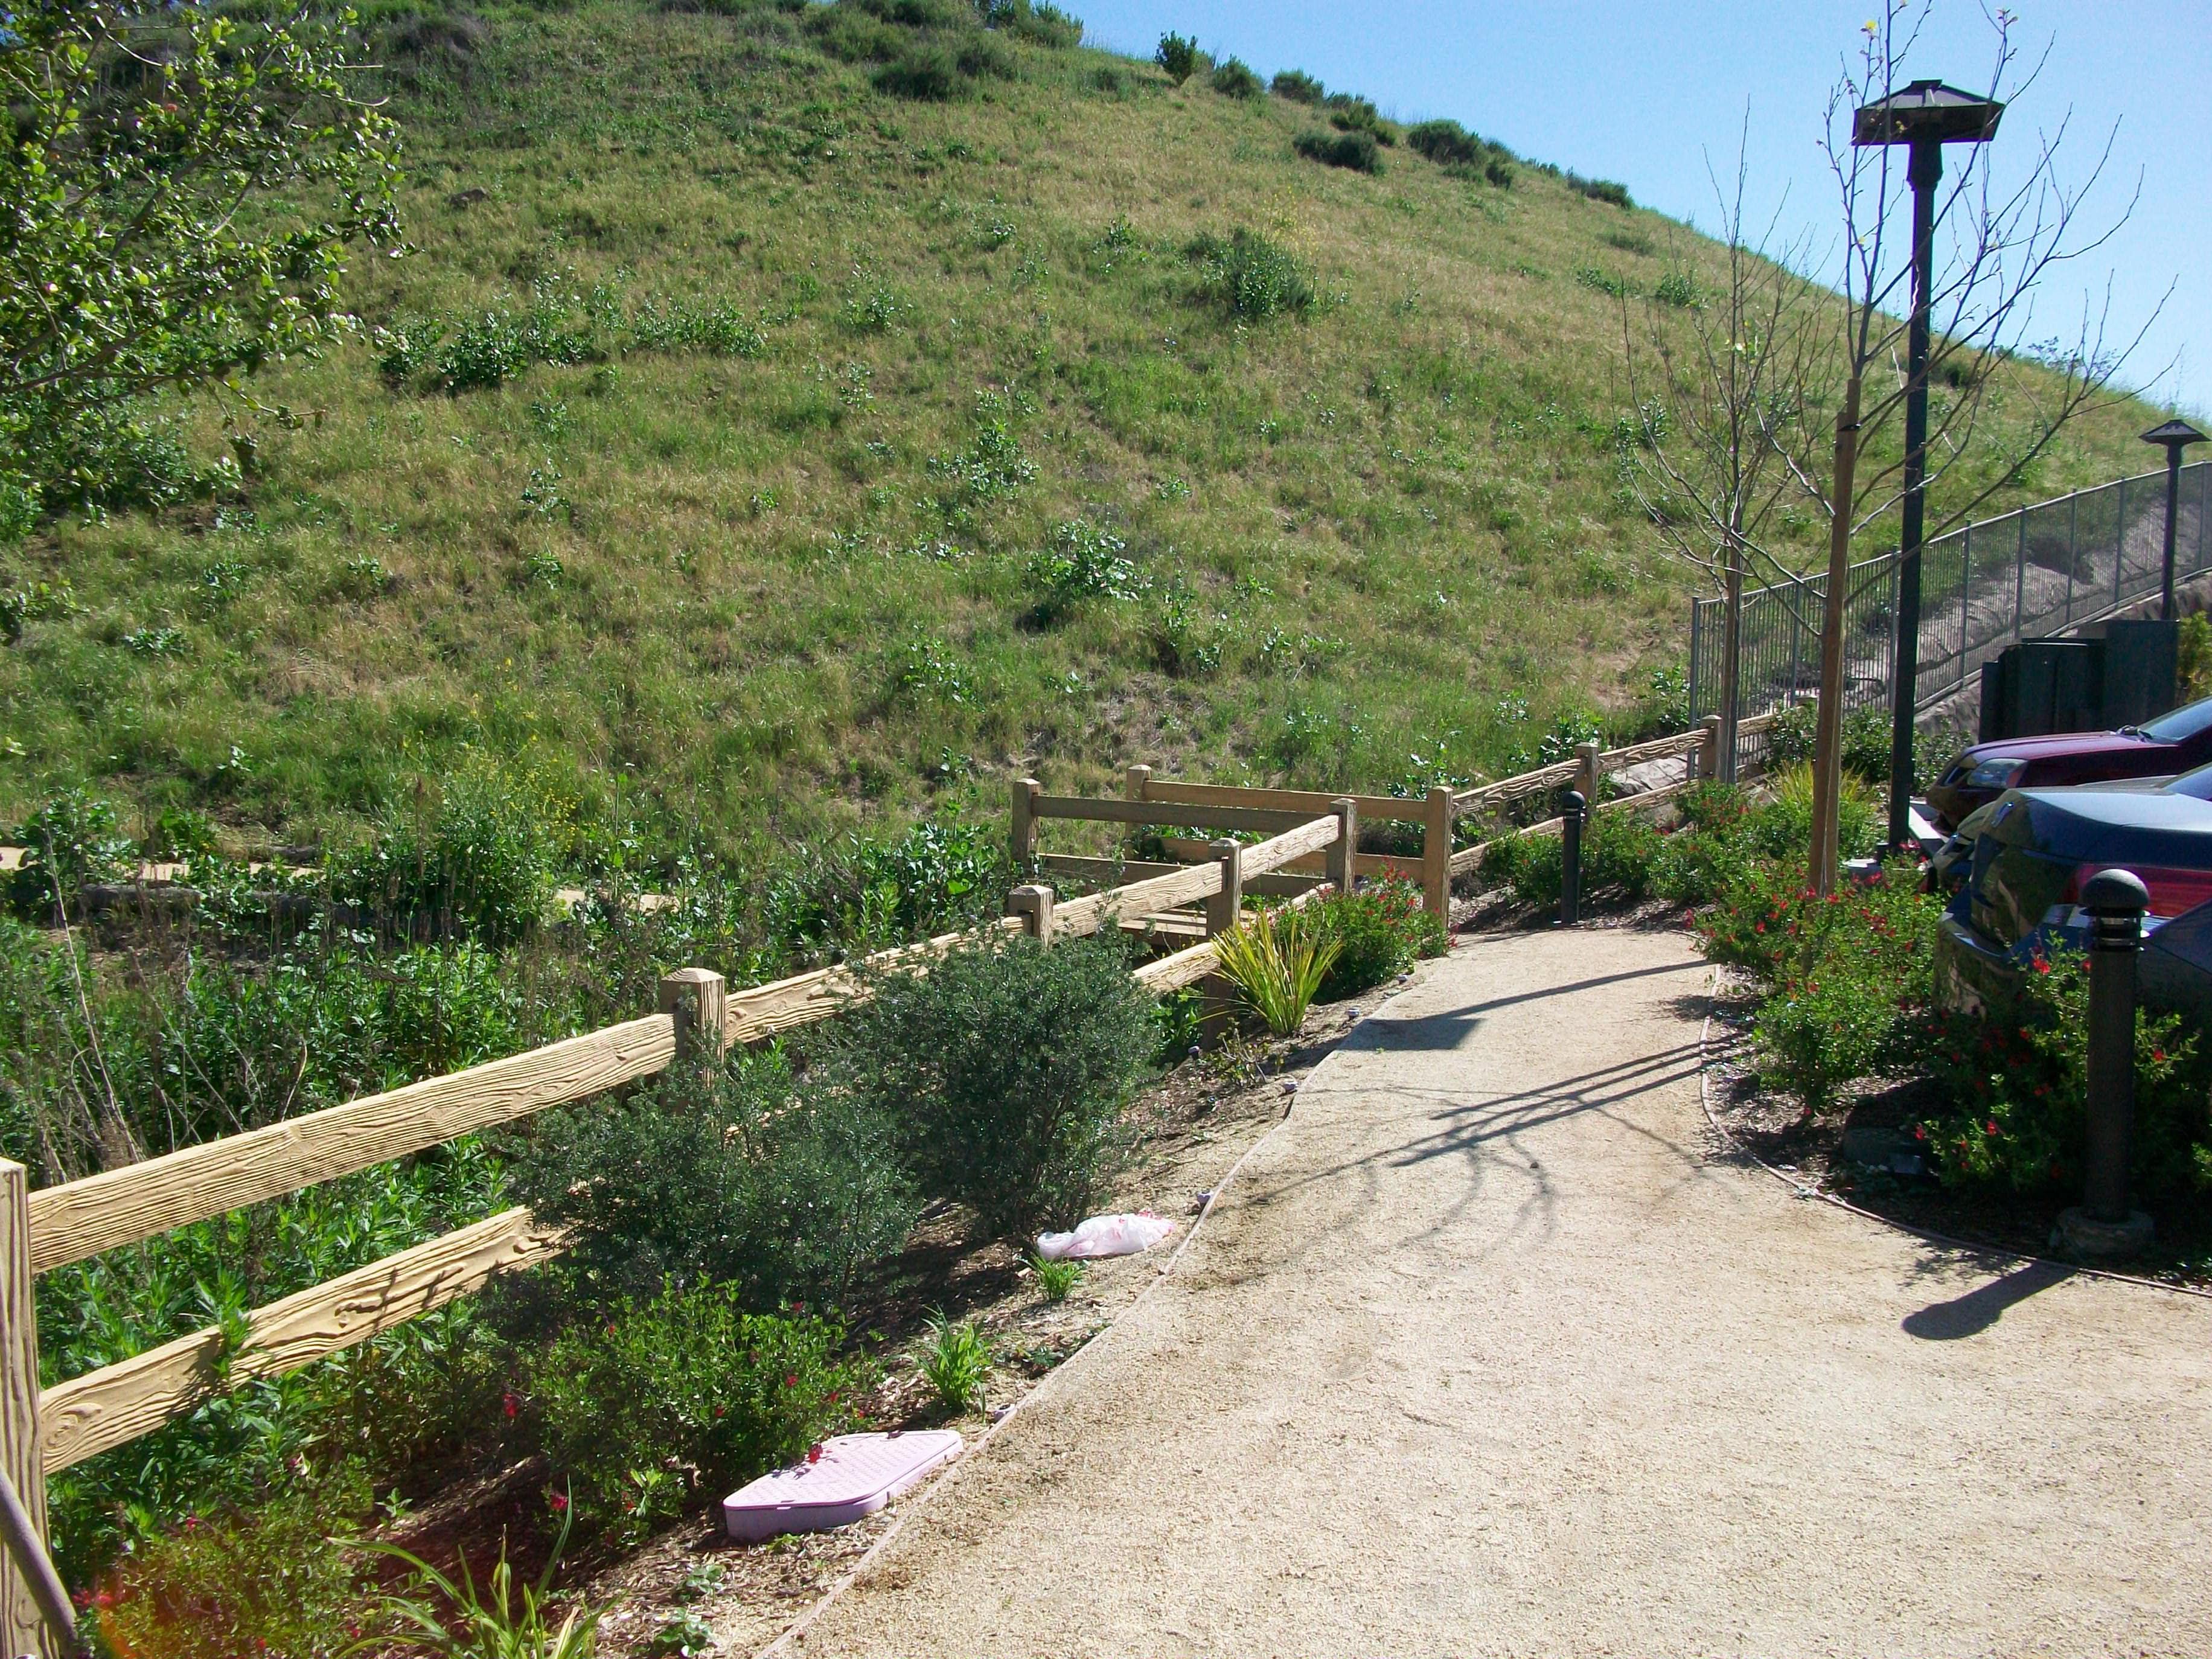 2-rail precast concrete fence